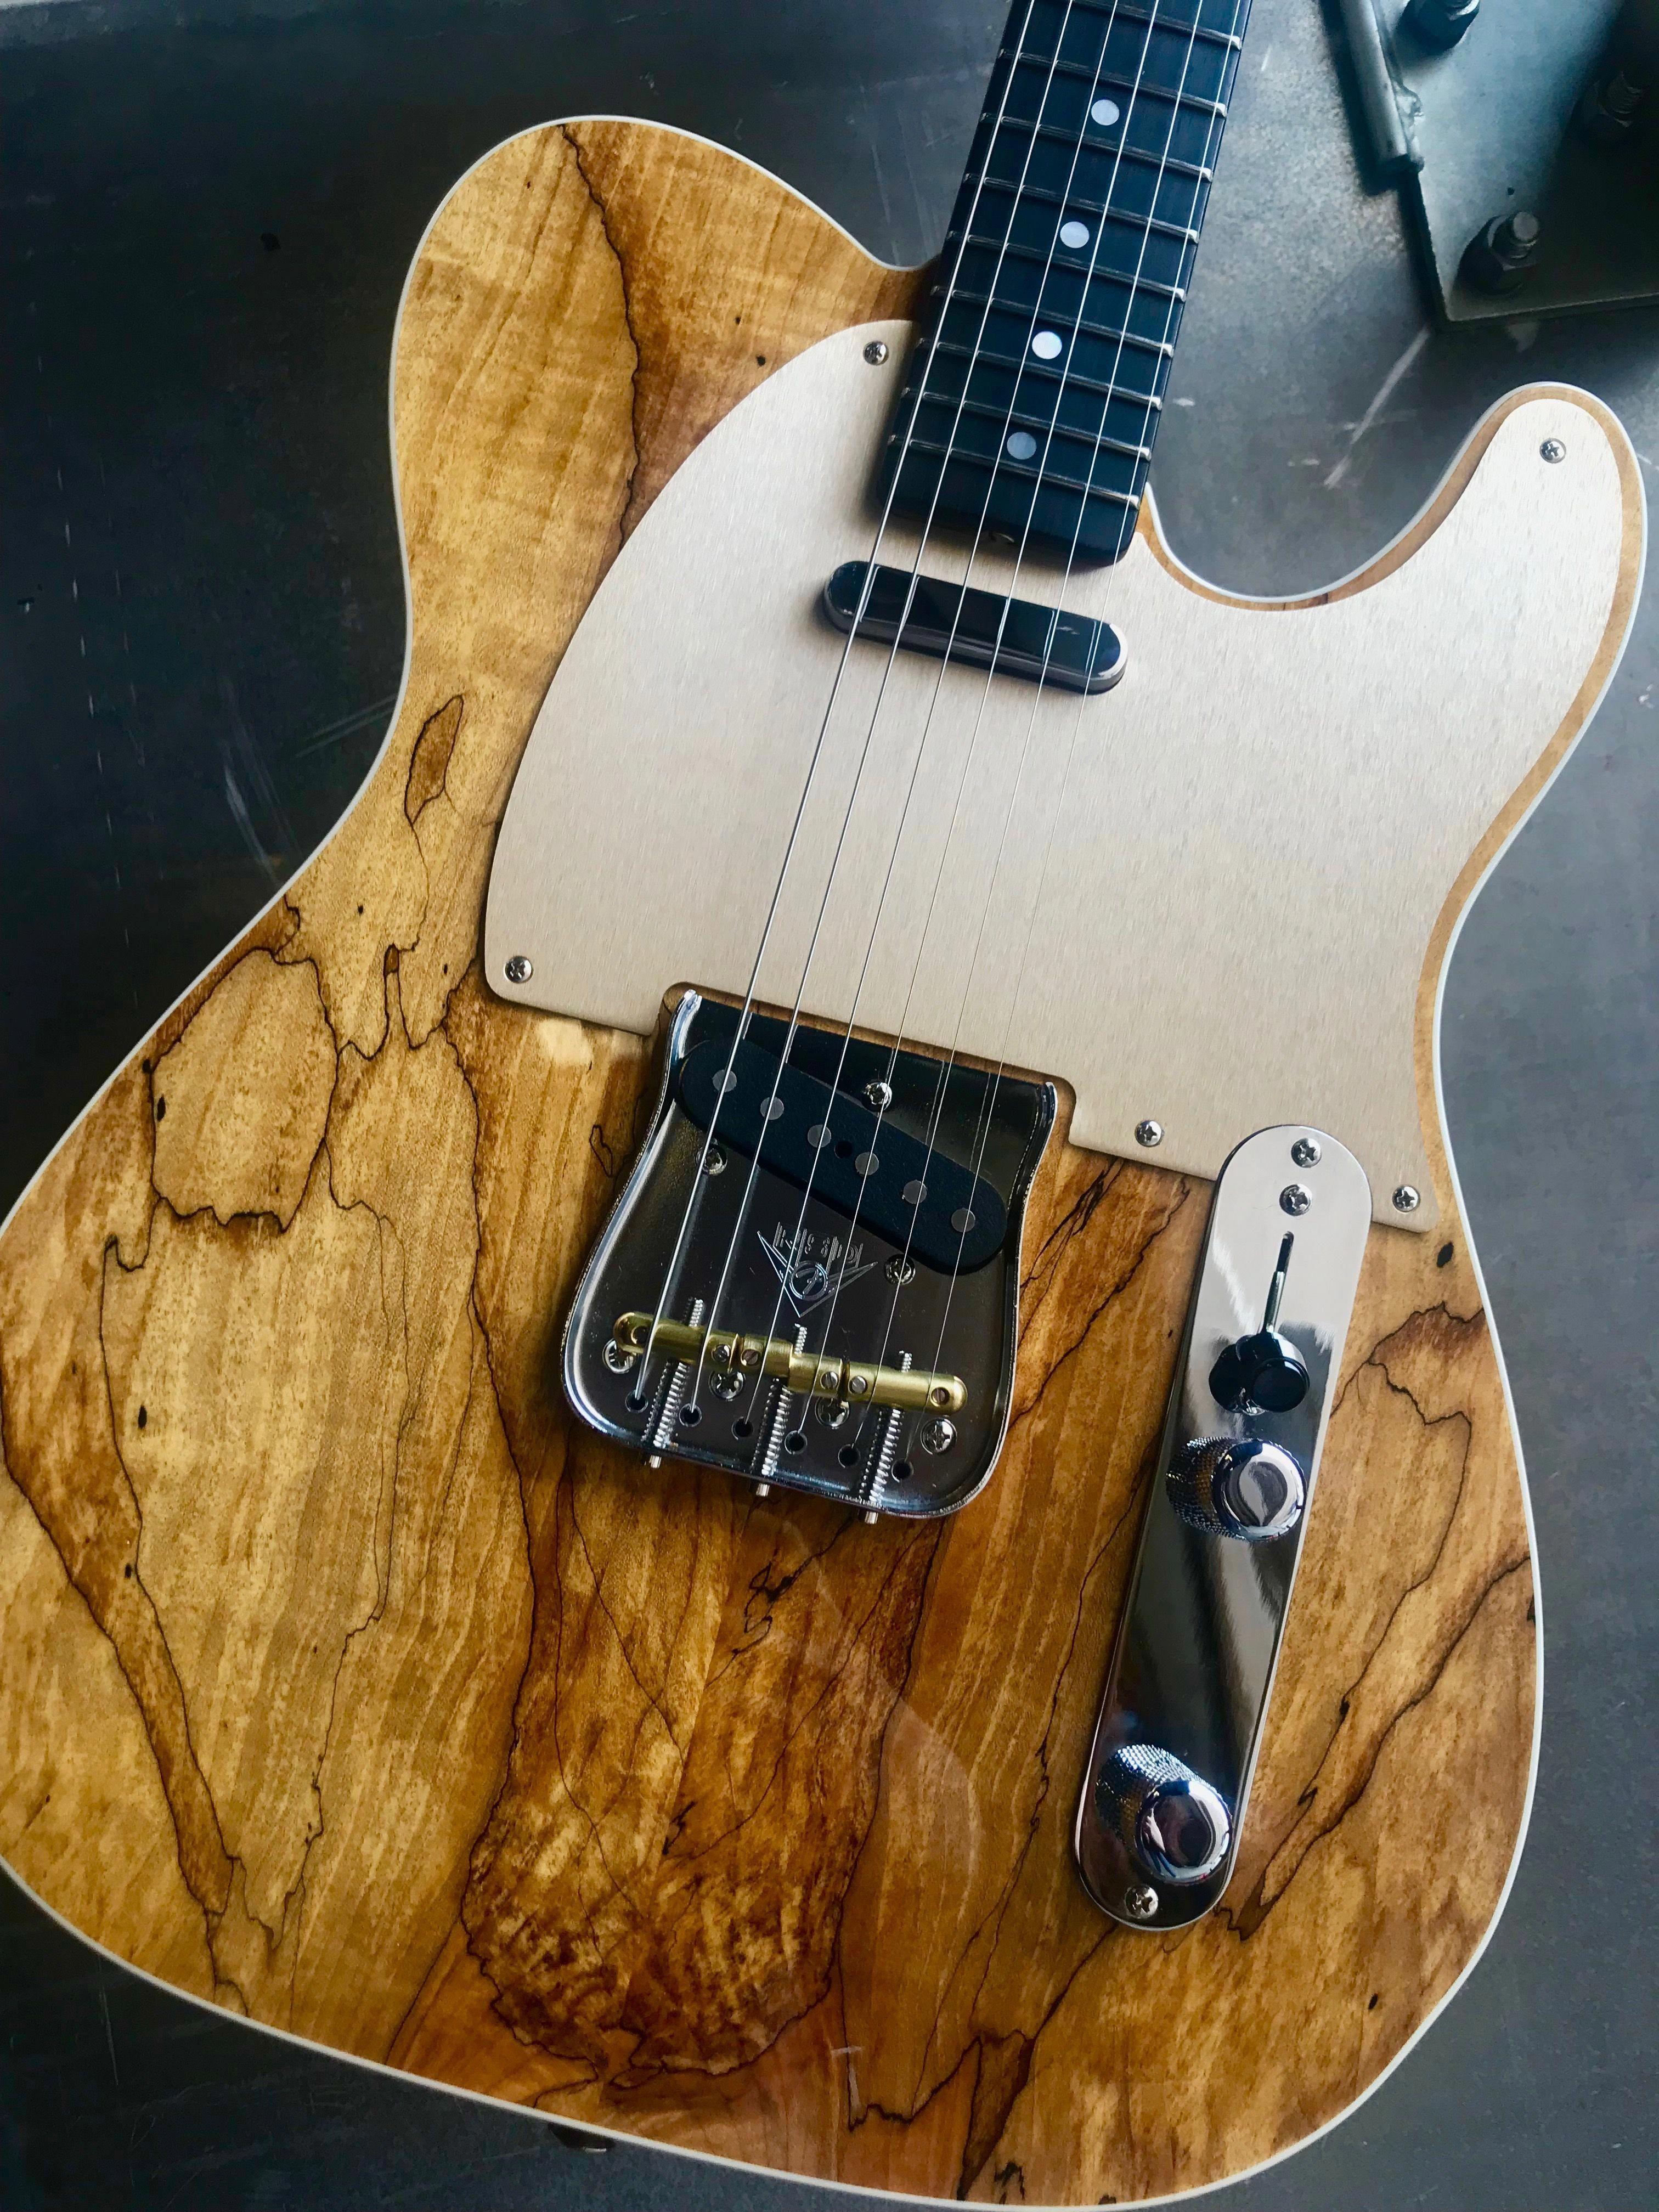 Looking For A Quality Guitar Here S A Great One Fenderguitars Fendertelecasterguitar Fender Custom Shop Telecaster Guitar Neck